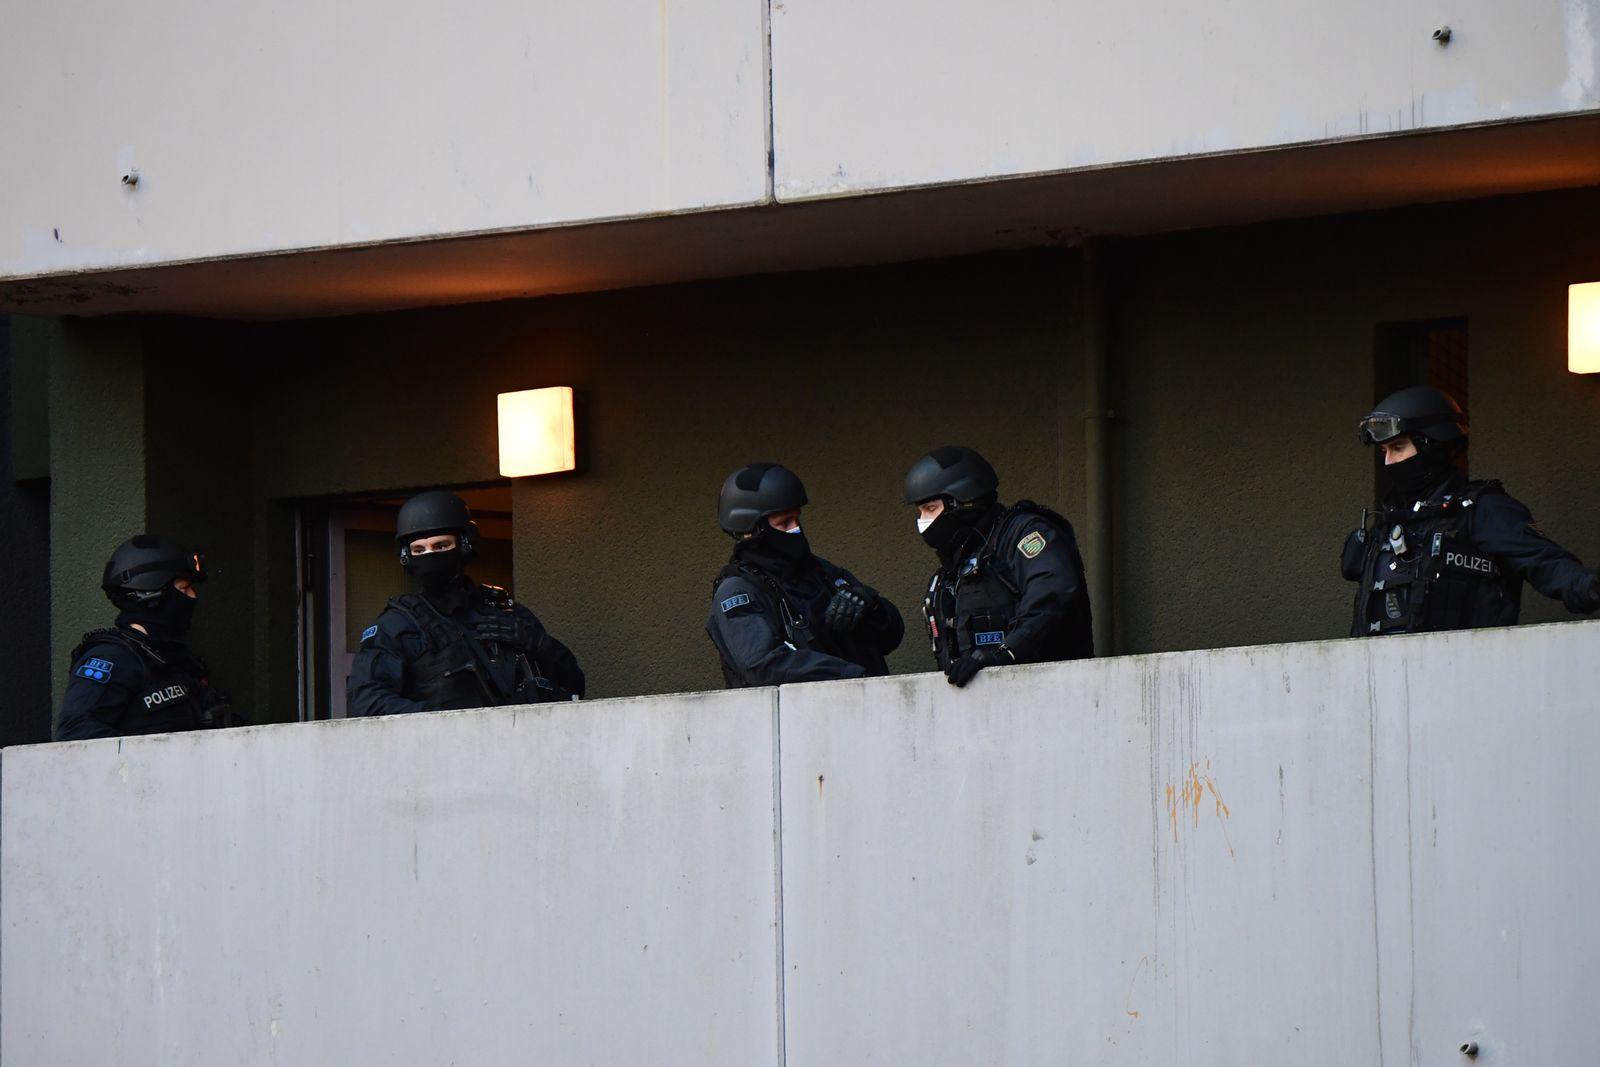 Police raid linked to burglary at Green Vault in Dresden, Berlin, Germany - 17 Nov 2020